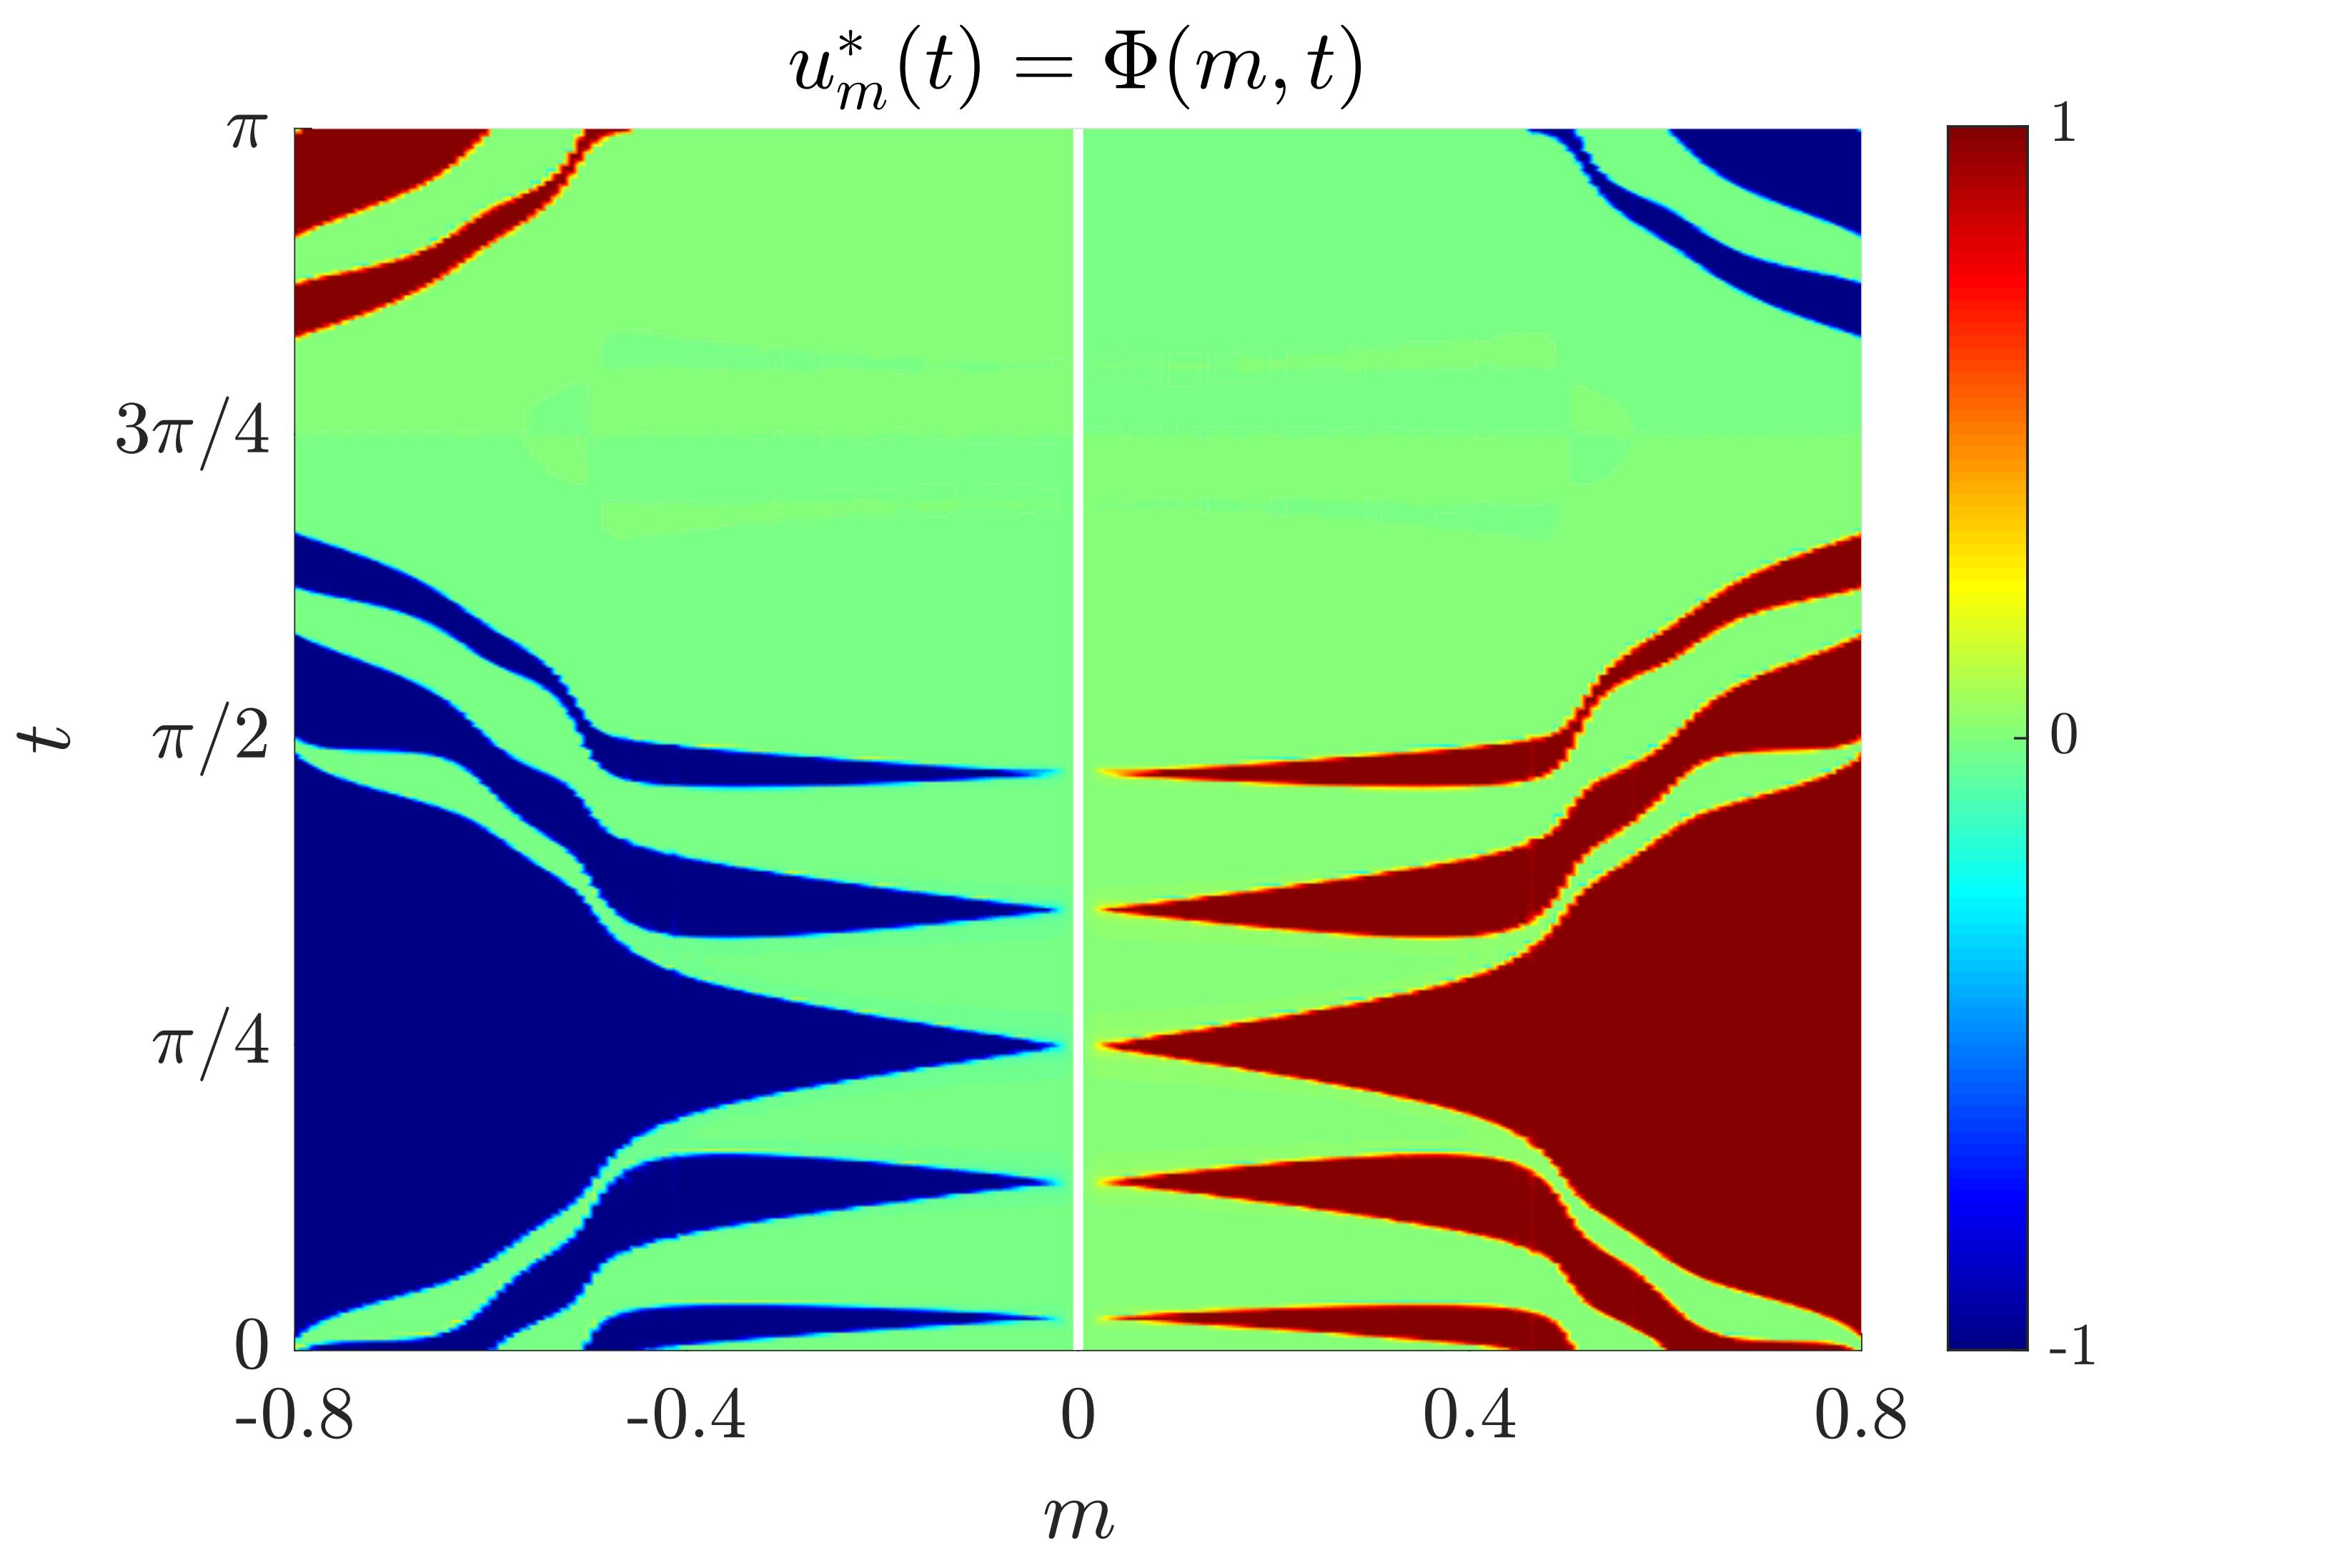 Figure 4. bang-off-bang control for the SHM problem